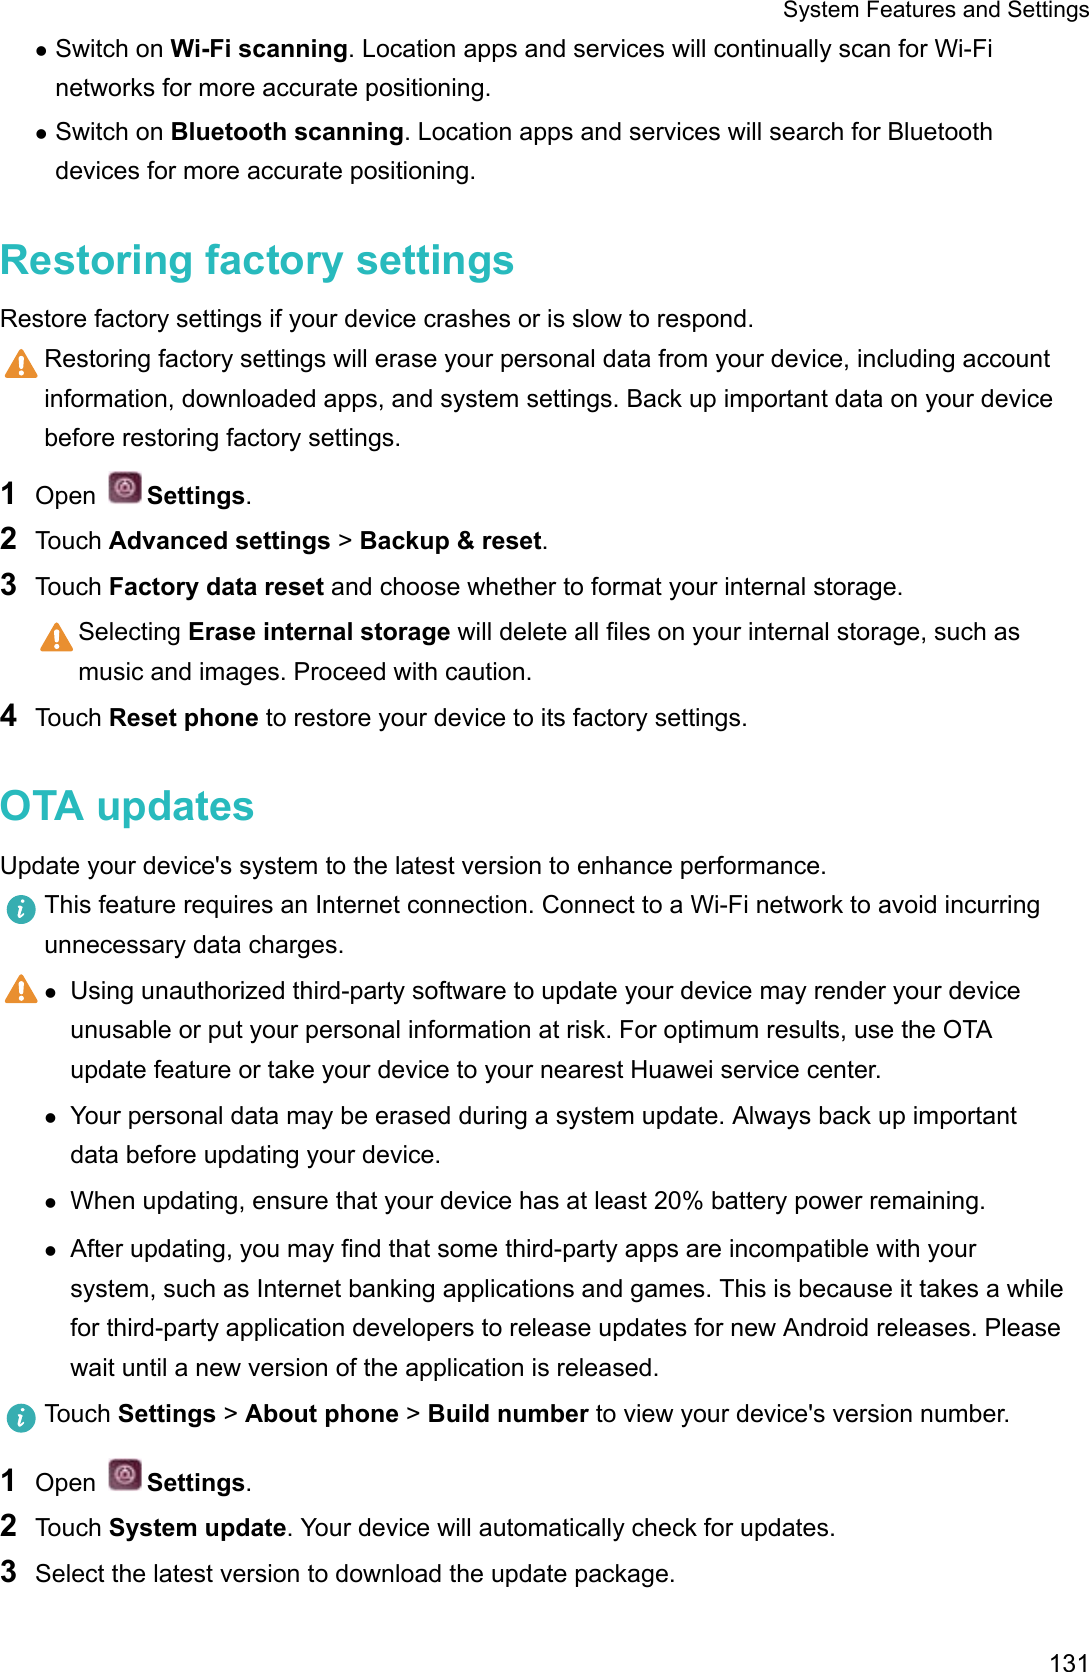 Huawei P10 Lite User Guide (WAS, 01, English)